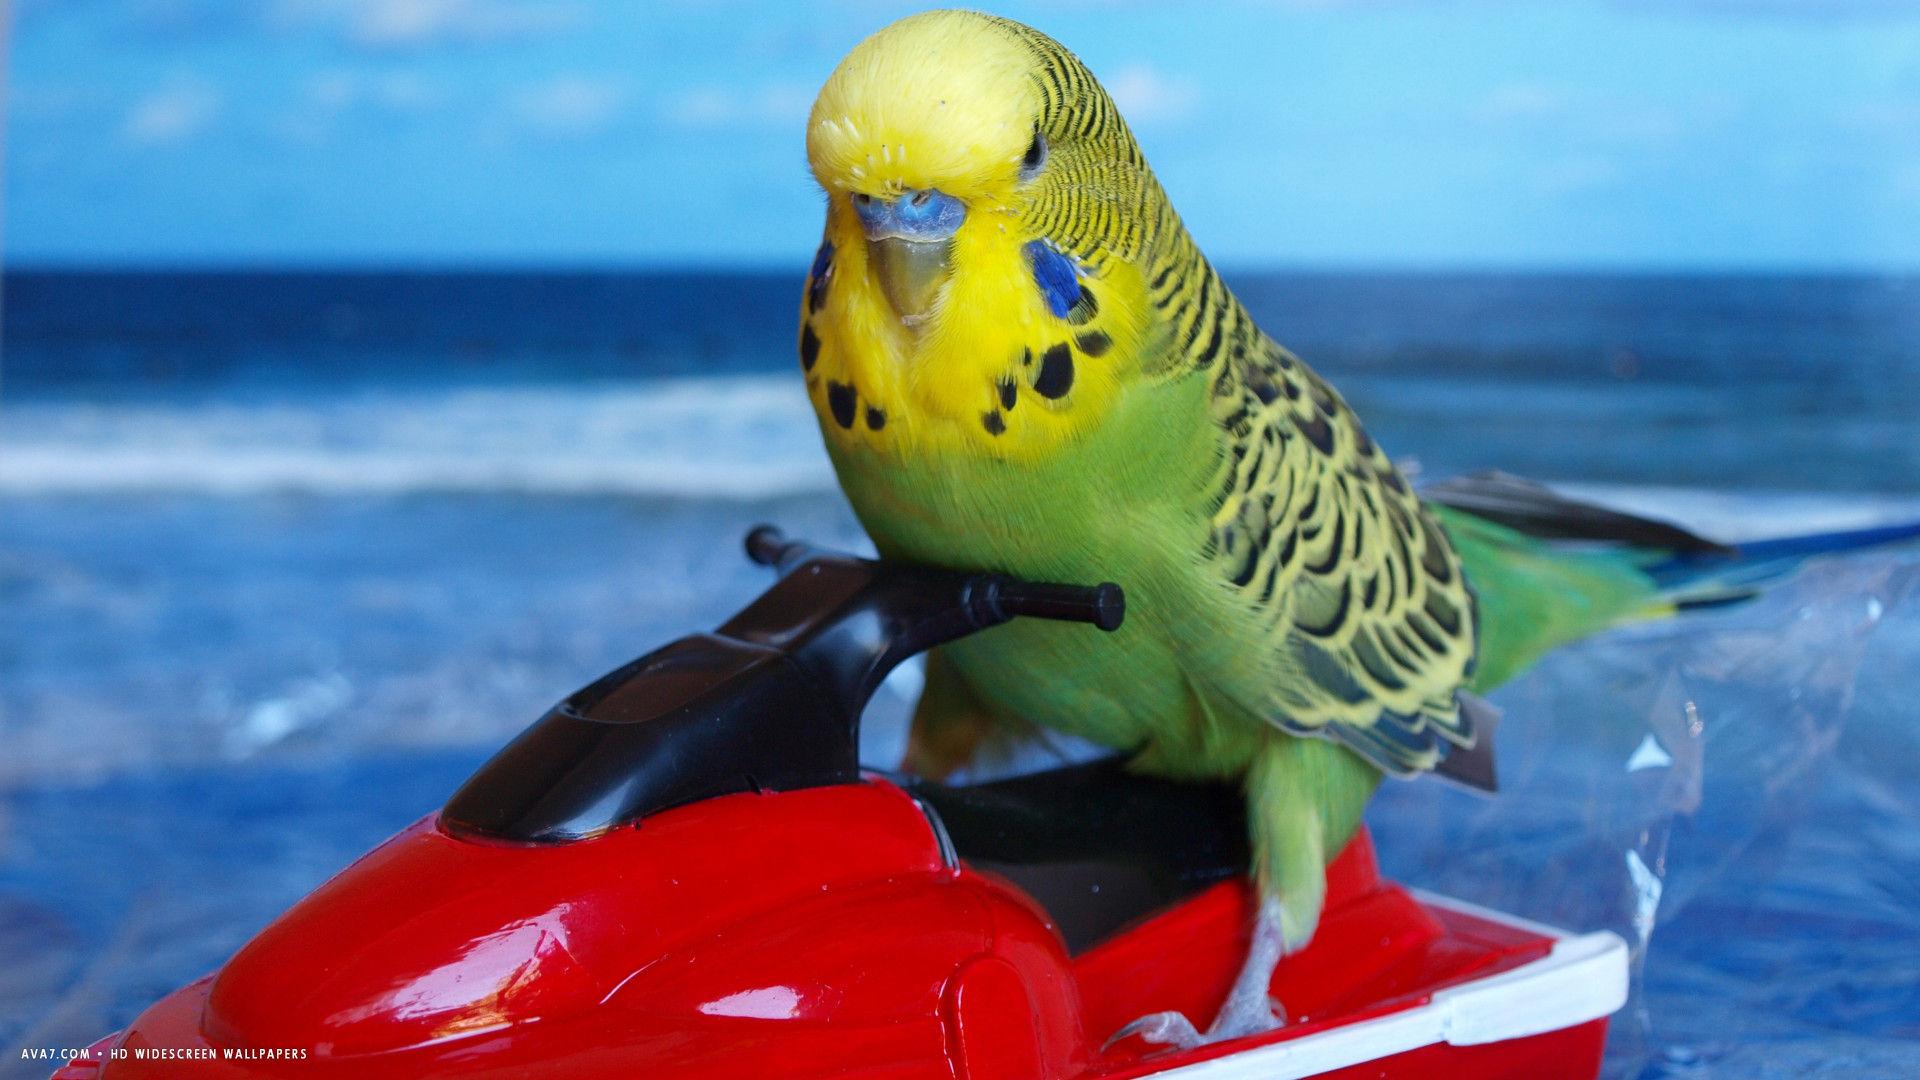 budgie funny sea bird hd widescreen wallpaper / birds backgrounds